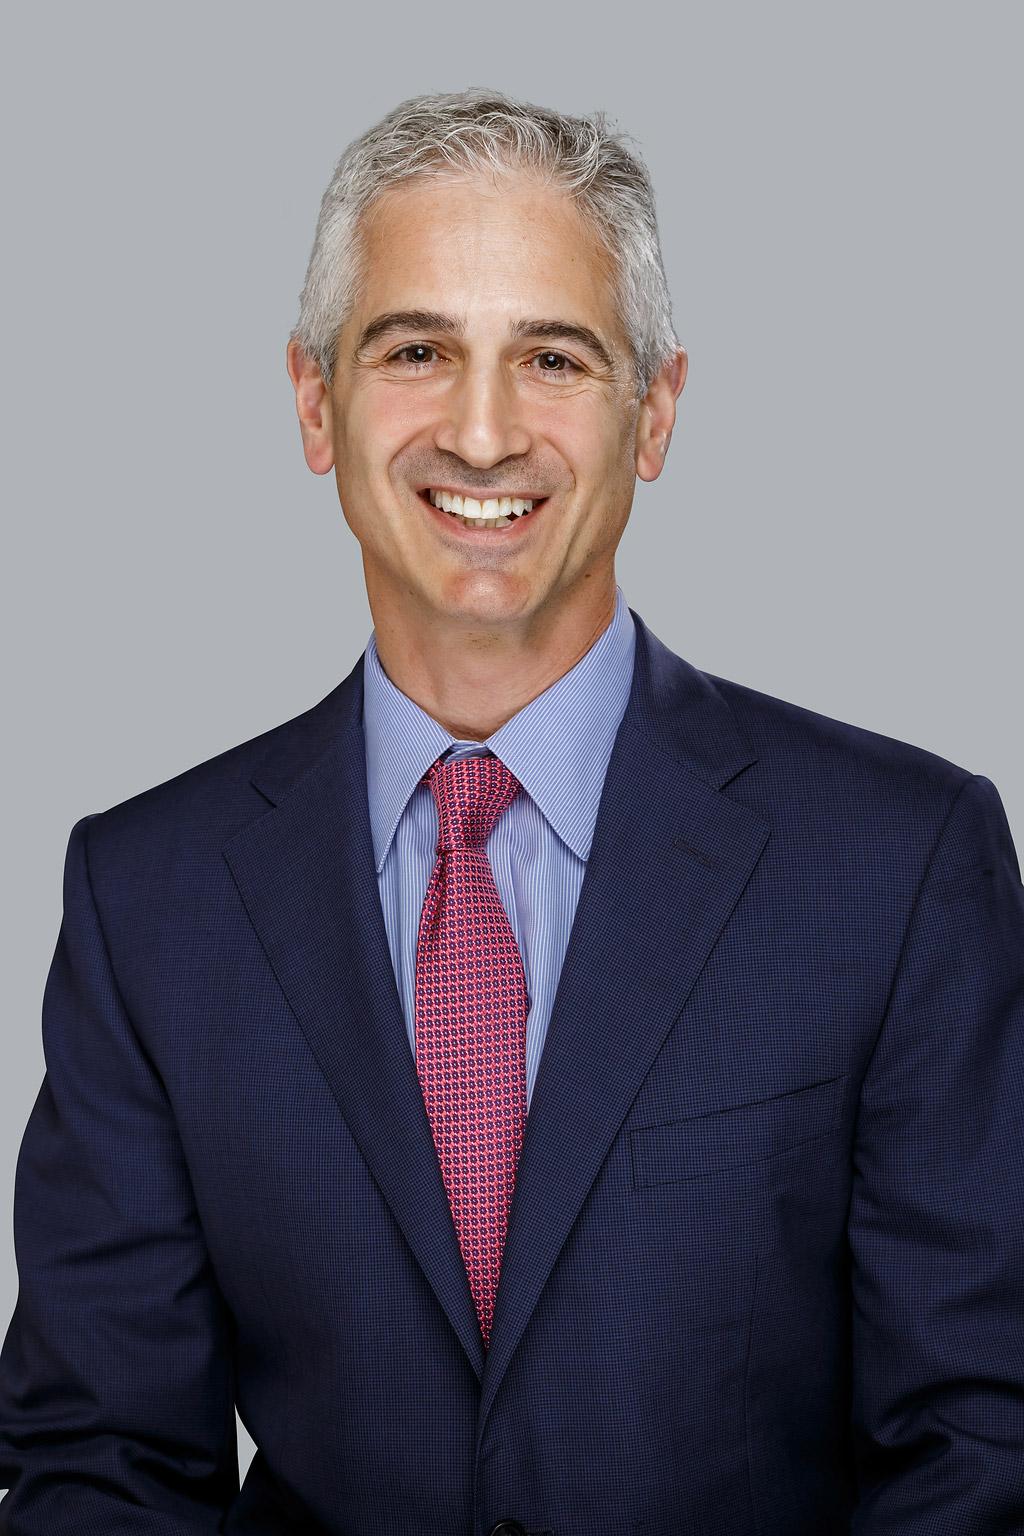 San Francisco Law School >> Steven R. Katz - BBR Partners - BBR Partners